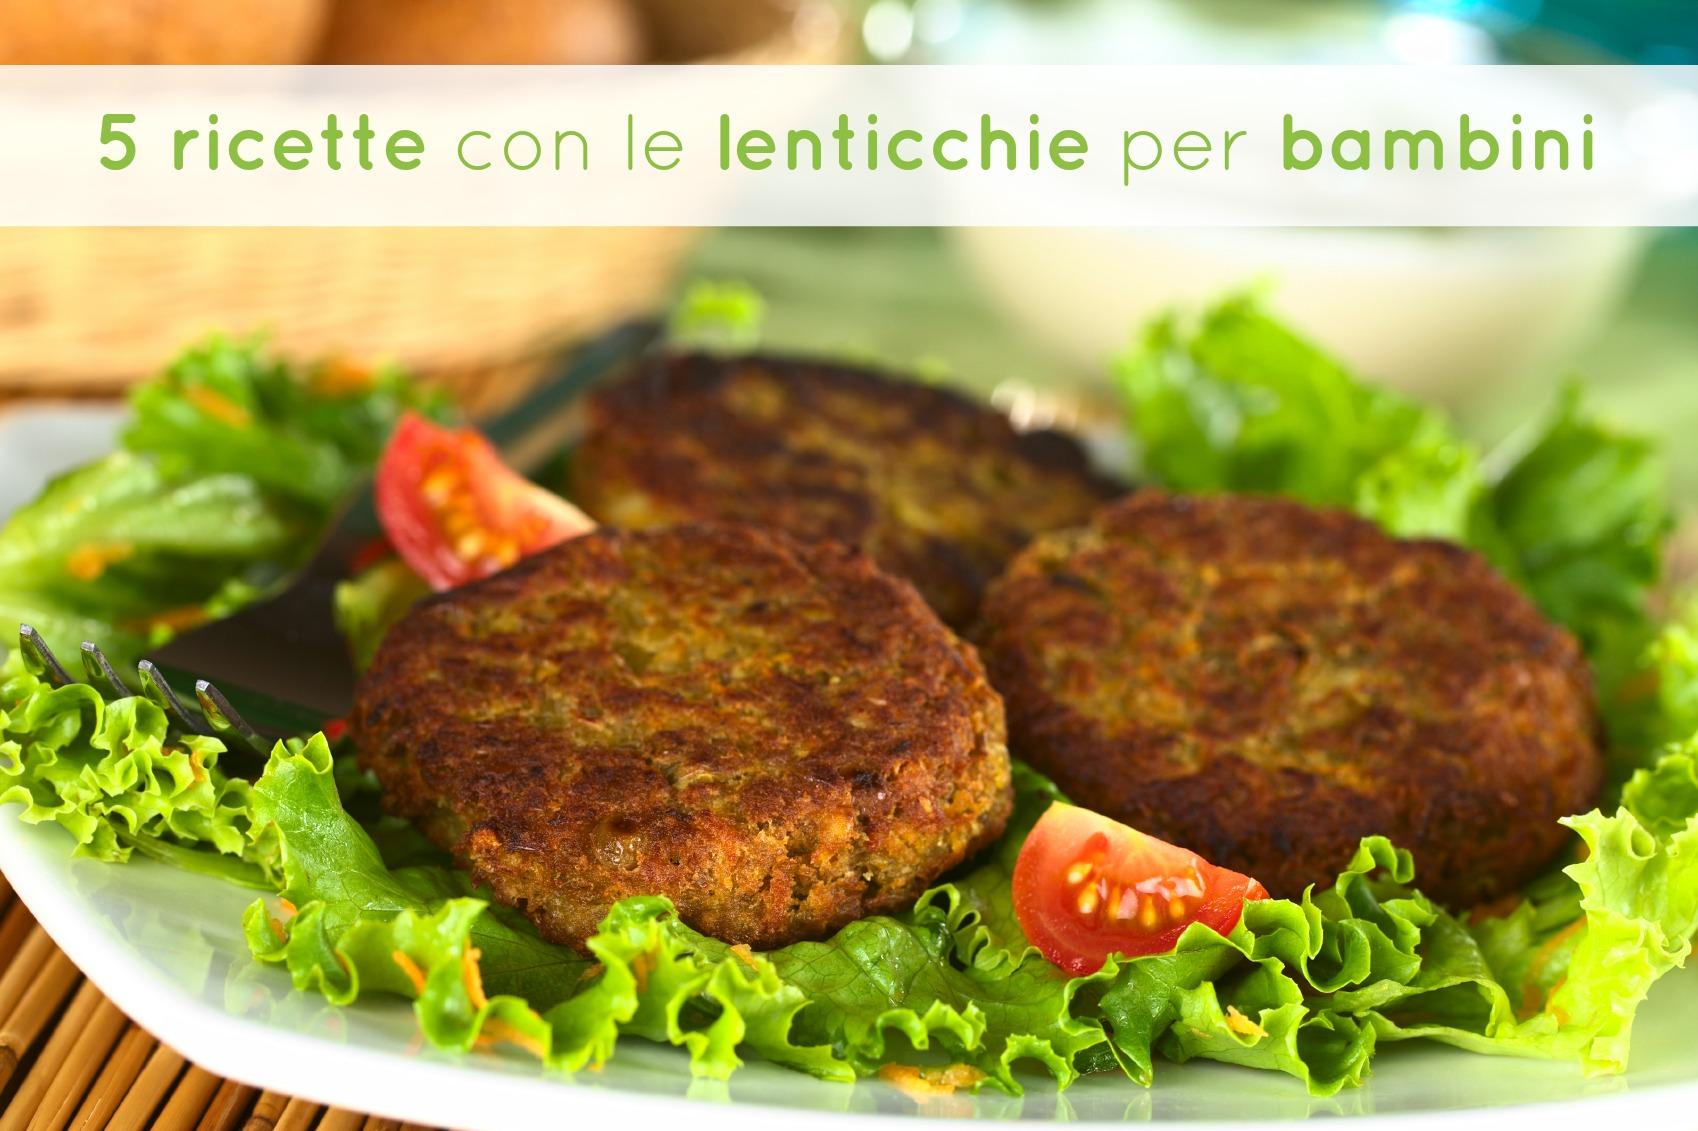 5 ricette con le lenticchie per bambini babygreen for Ricette bambini